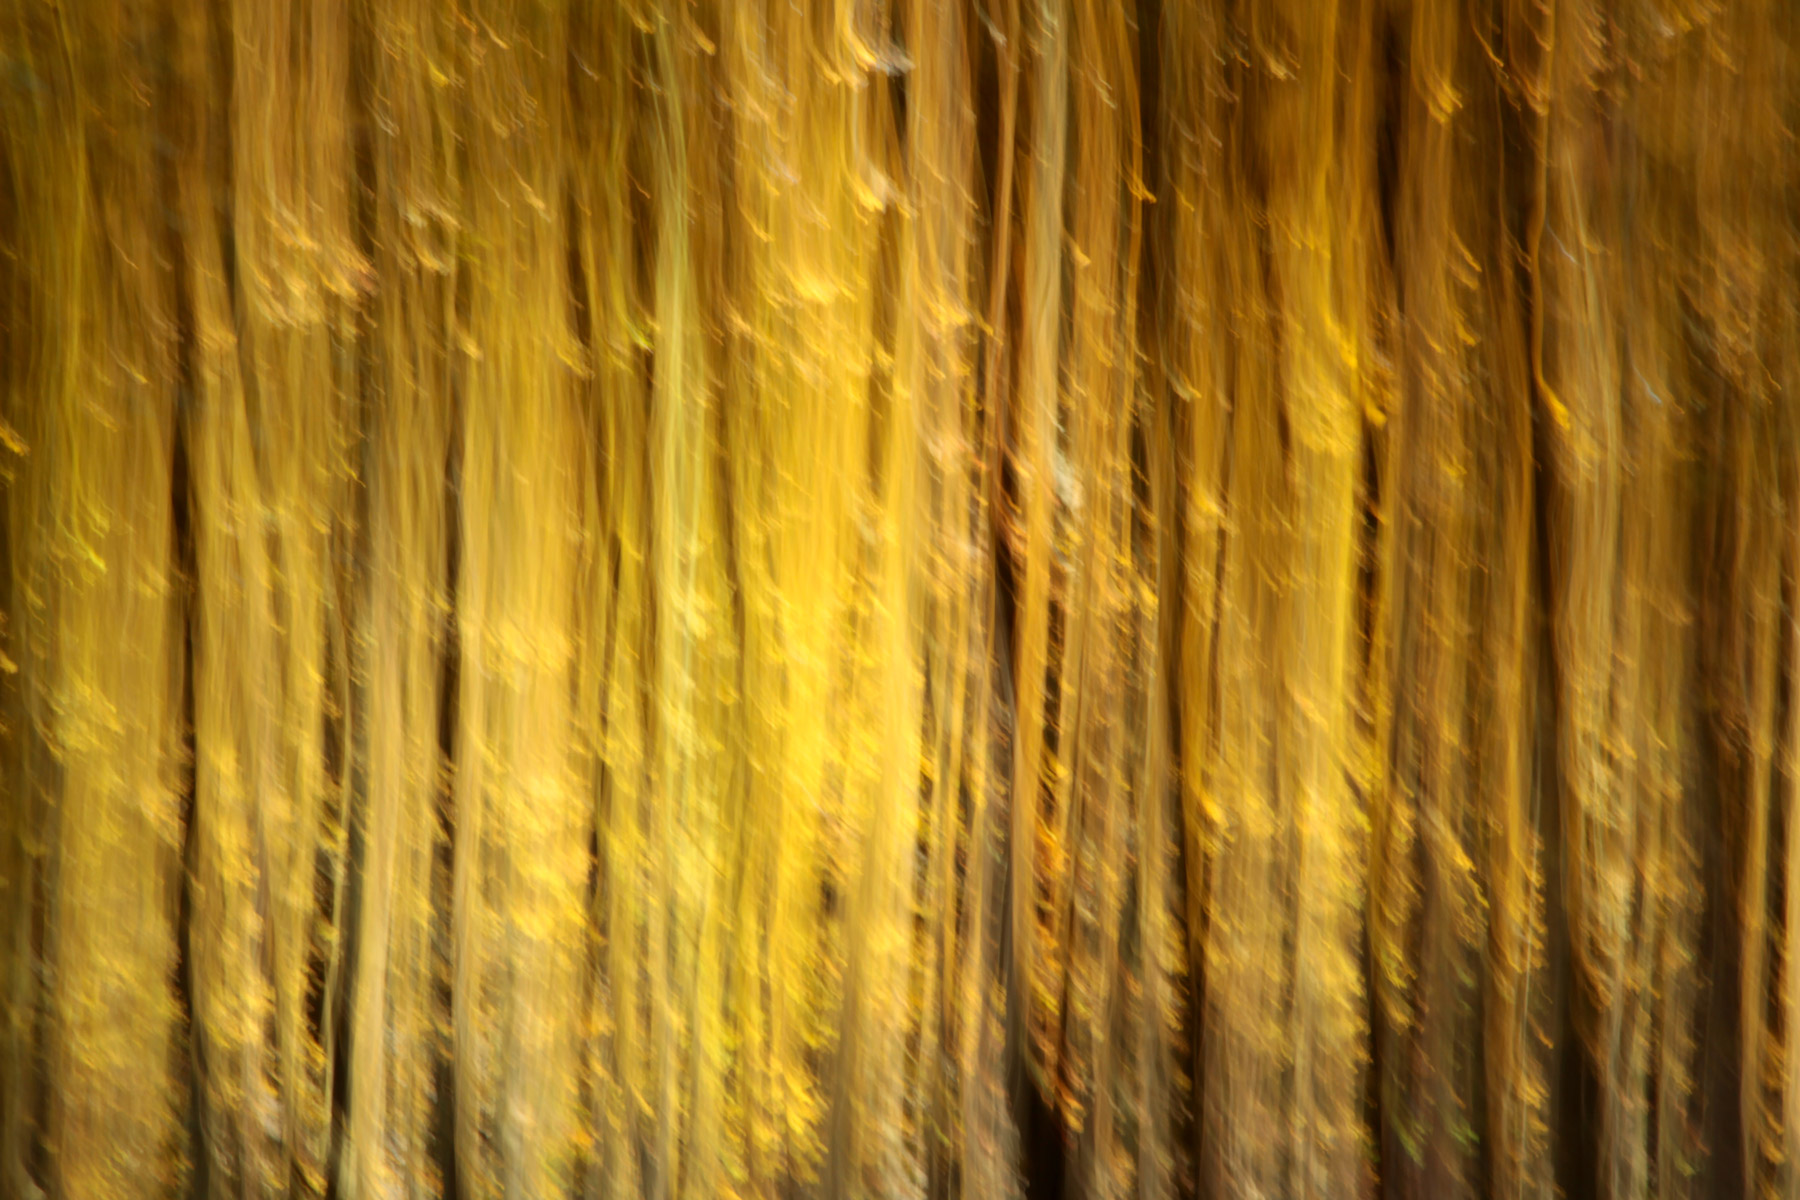 Vor lauter Bäumen XI, 2017, Fotografie